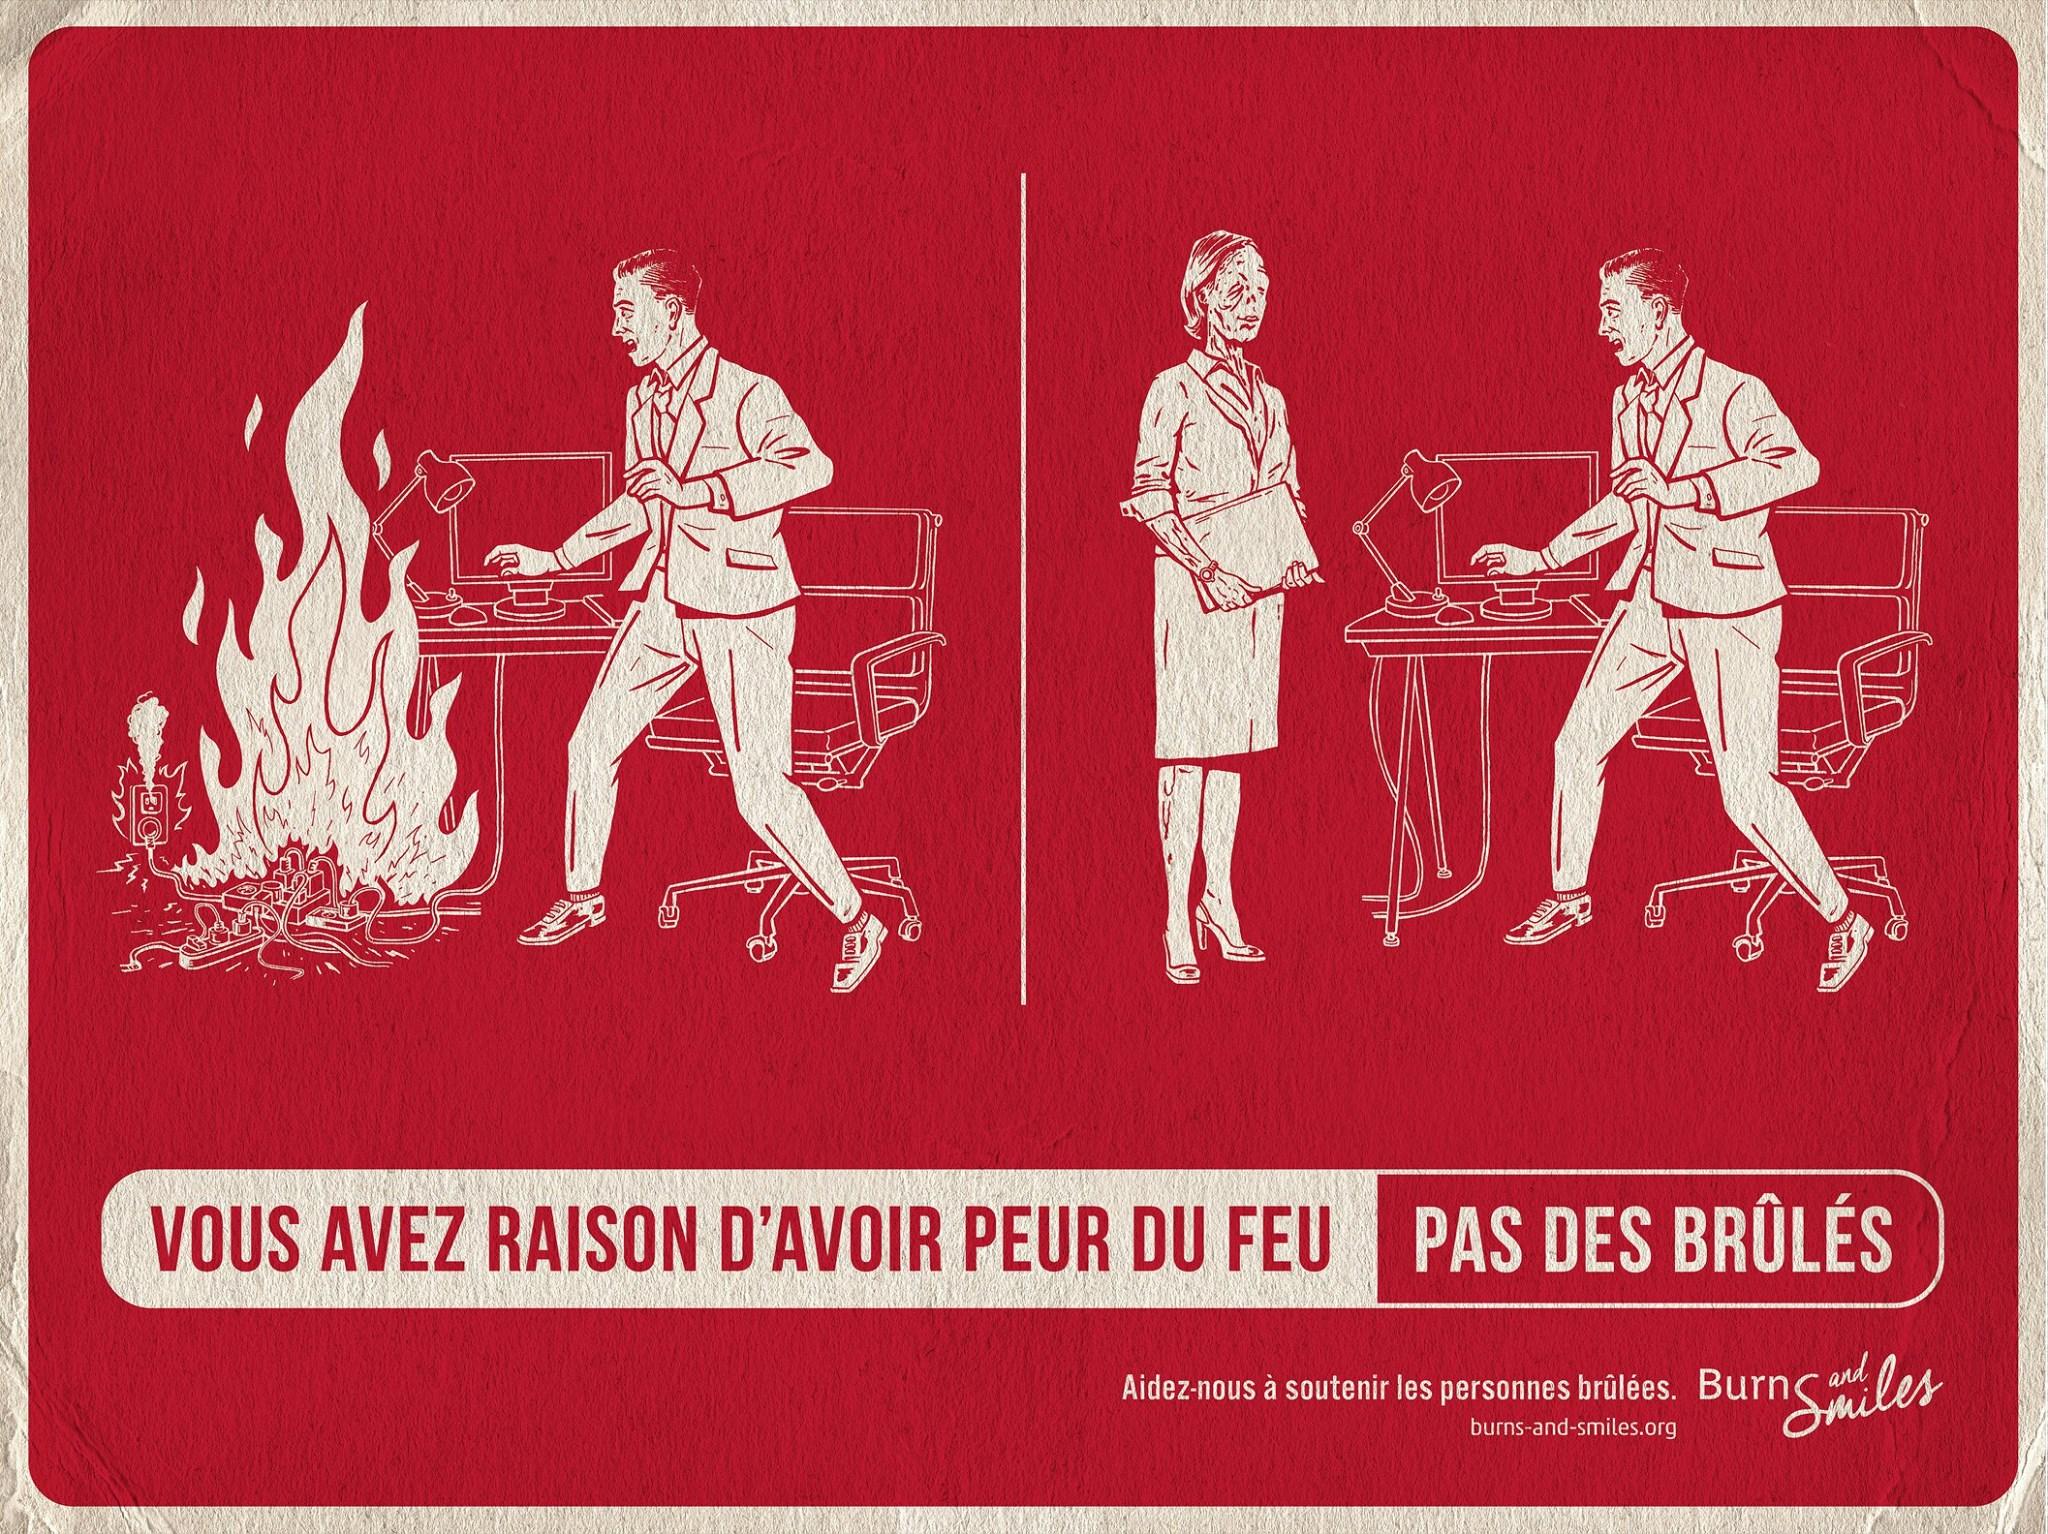 burns-and-smiles-publicite-communication-print-press-ad-feu-brules-burn-agence-tbwa-paris-4